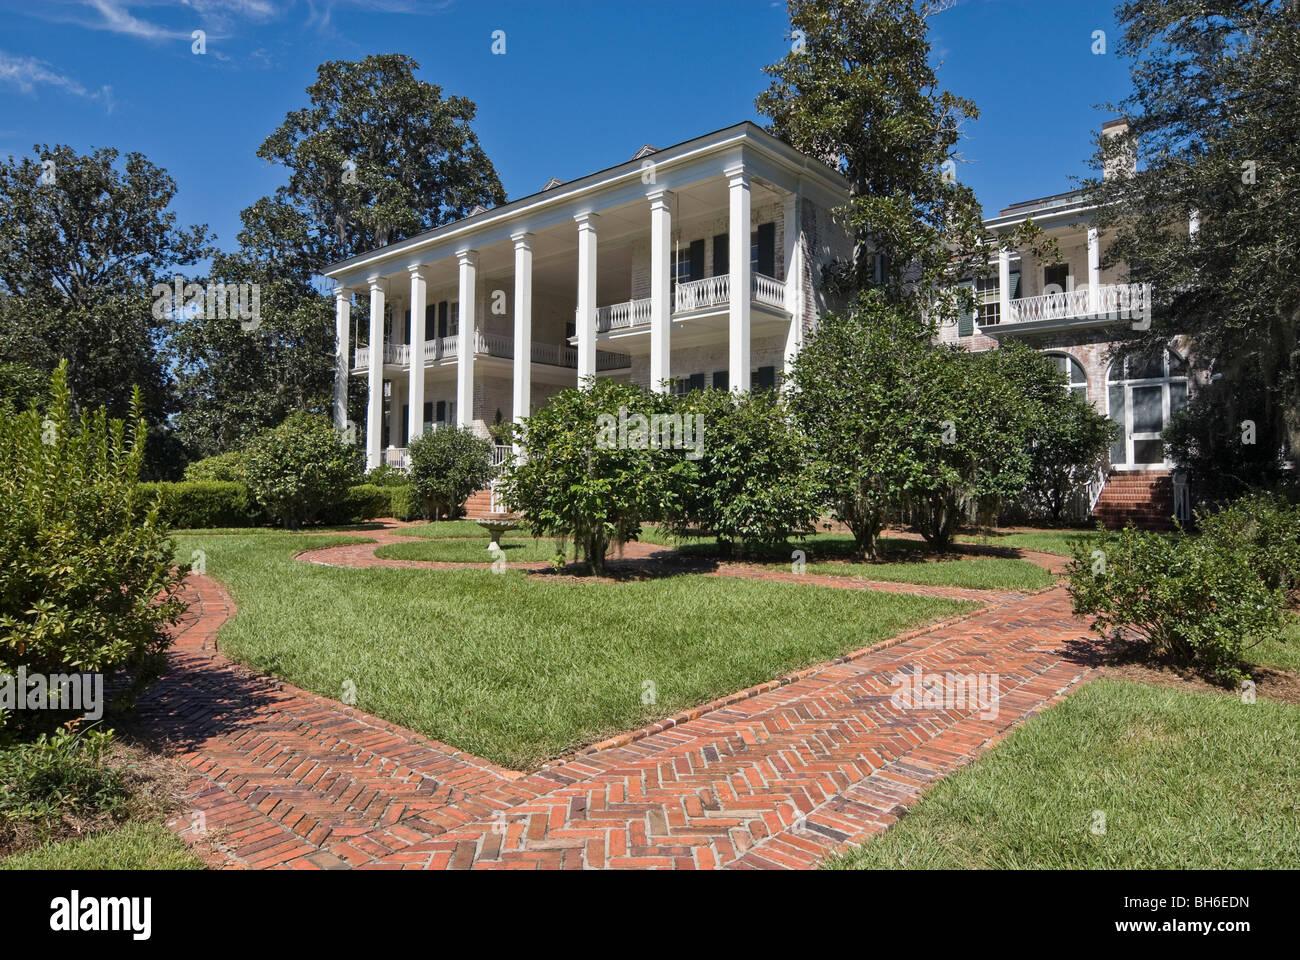 Pebble Hill Plantation House And Garden, Georgia, USA